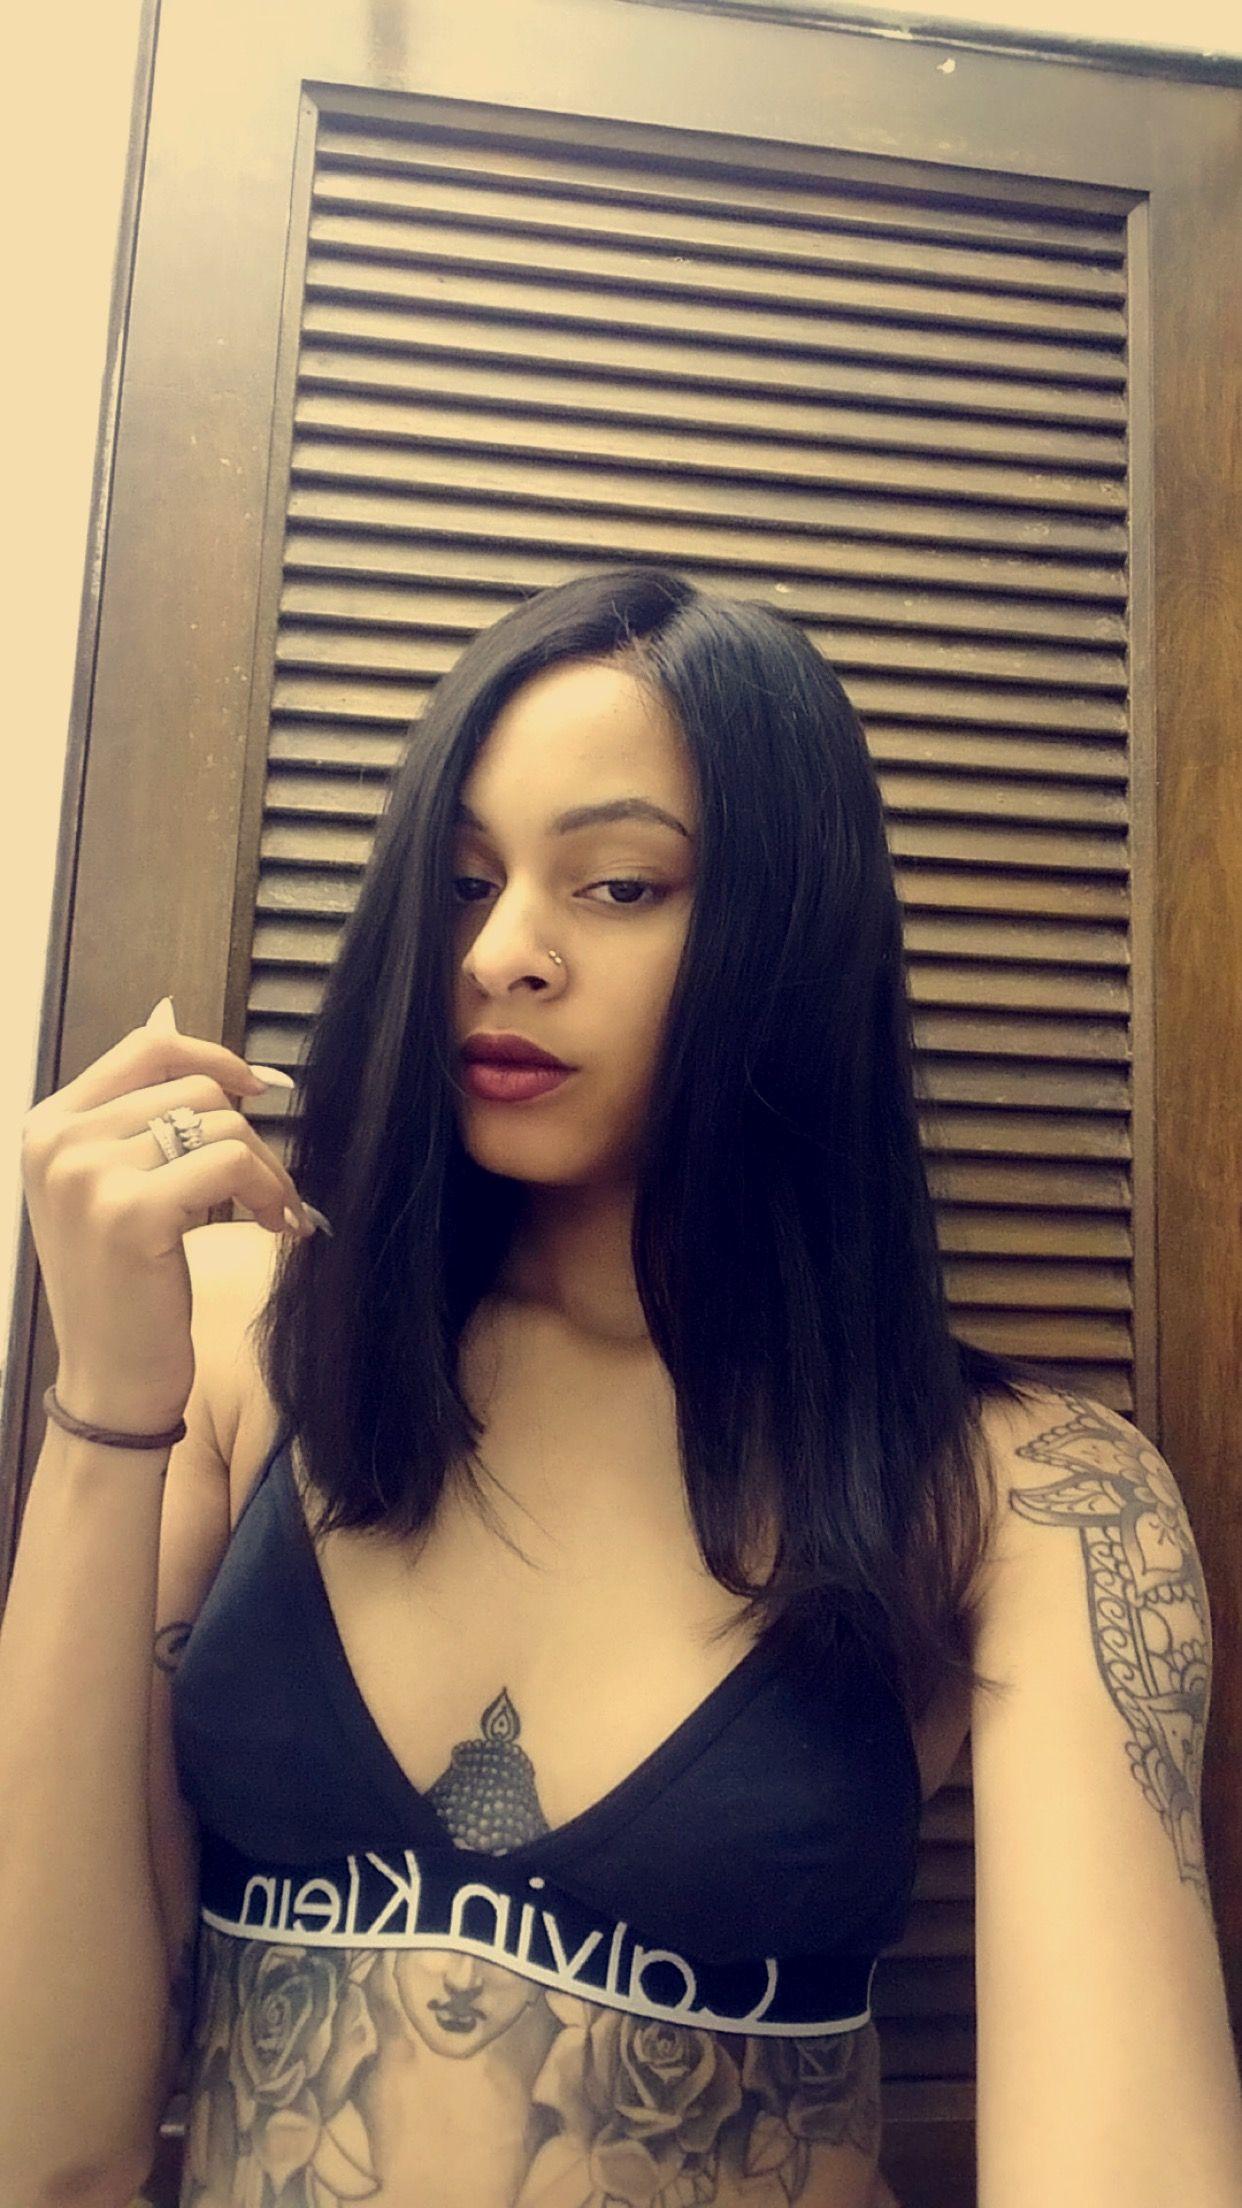 Selfie Berit Birkeland River Liana Yasmina Jones